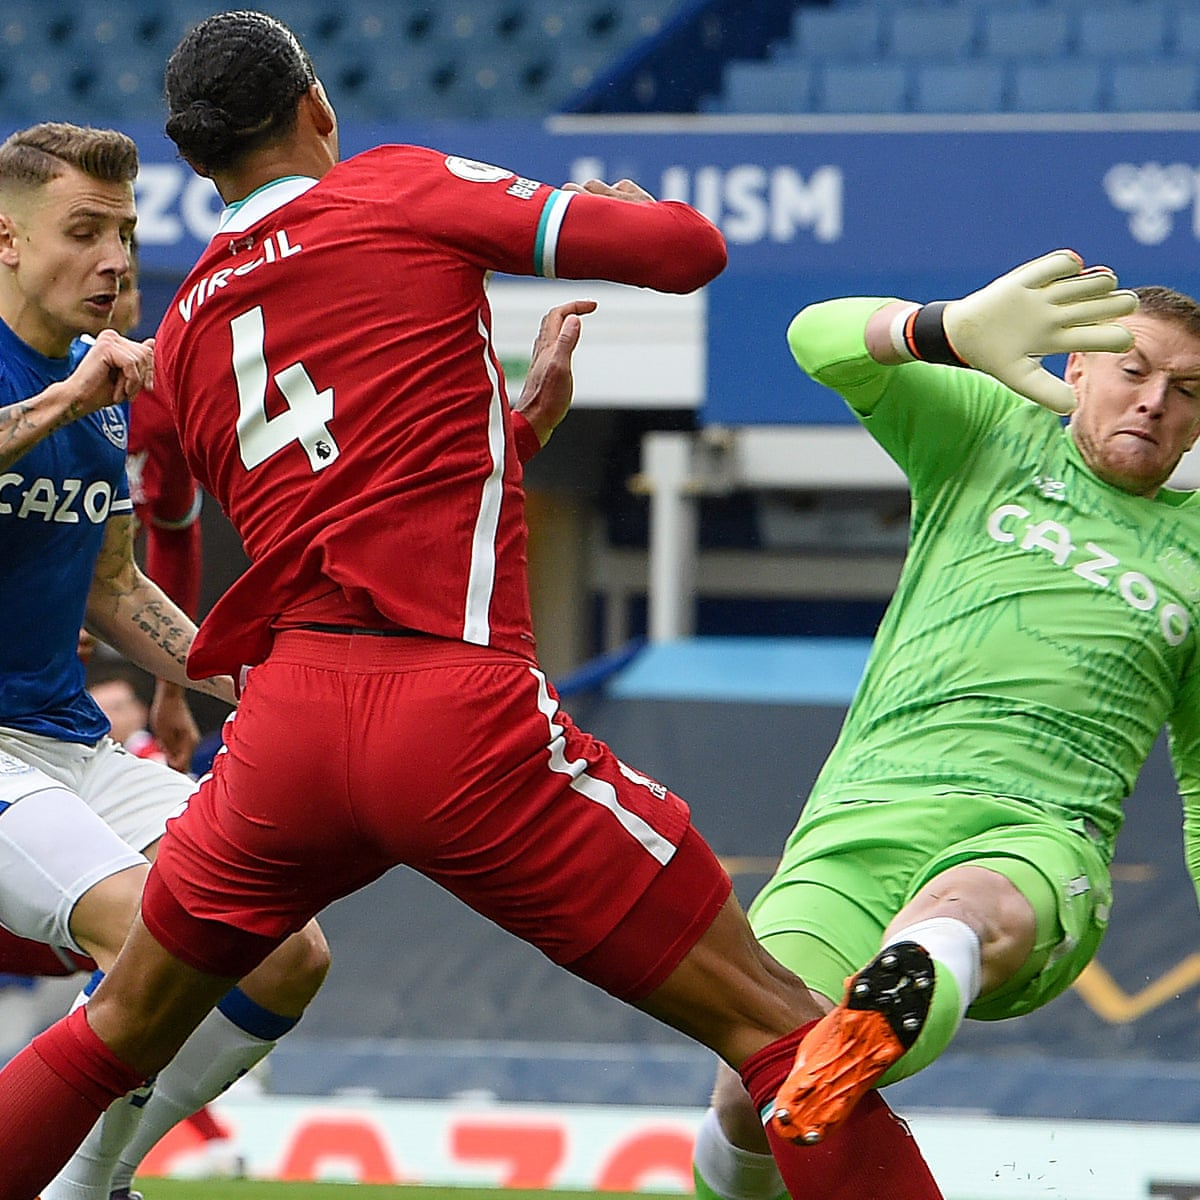 Liverpool's Virgil van Dijk facing surgery and long absence with cruciate  injury | Football | The Guardian